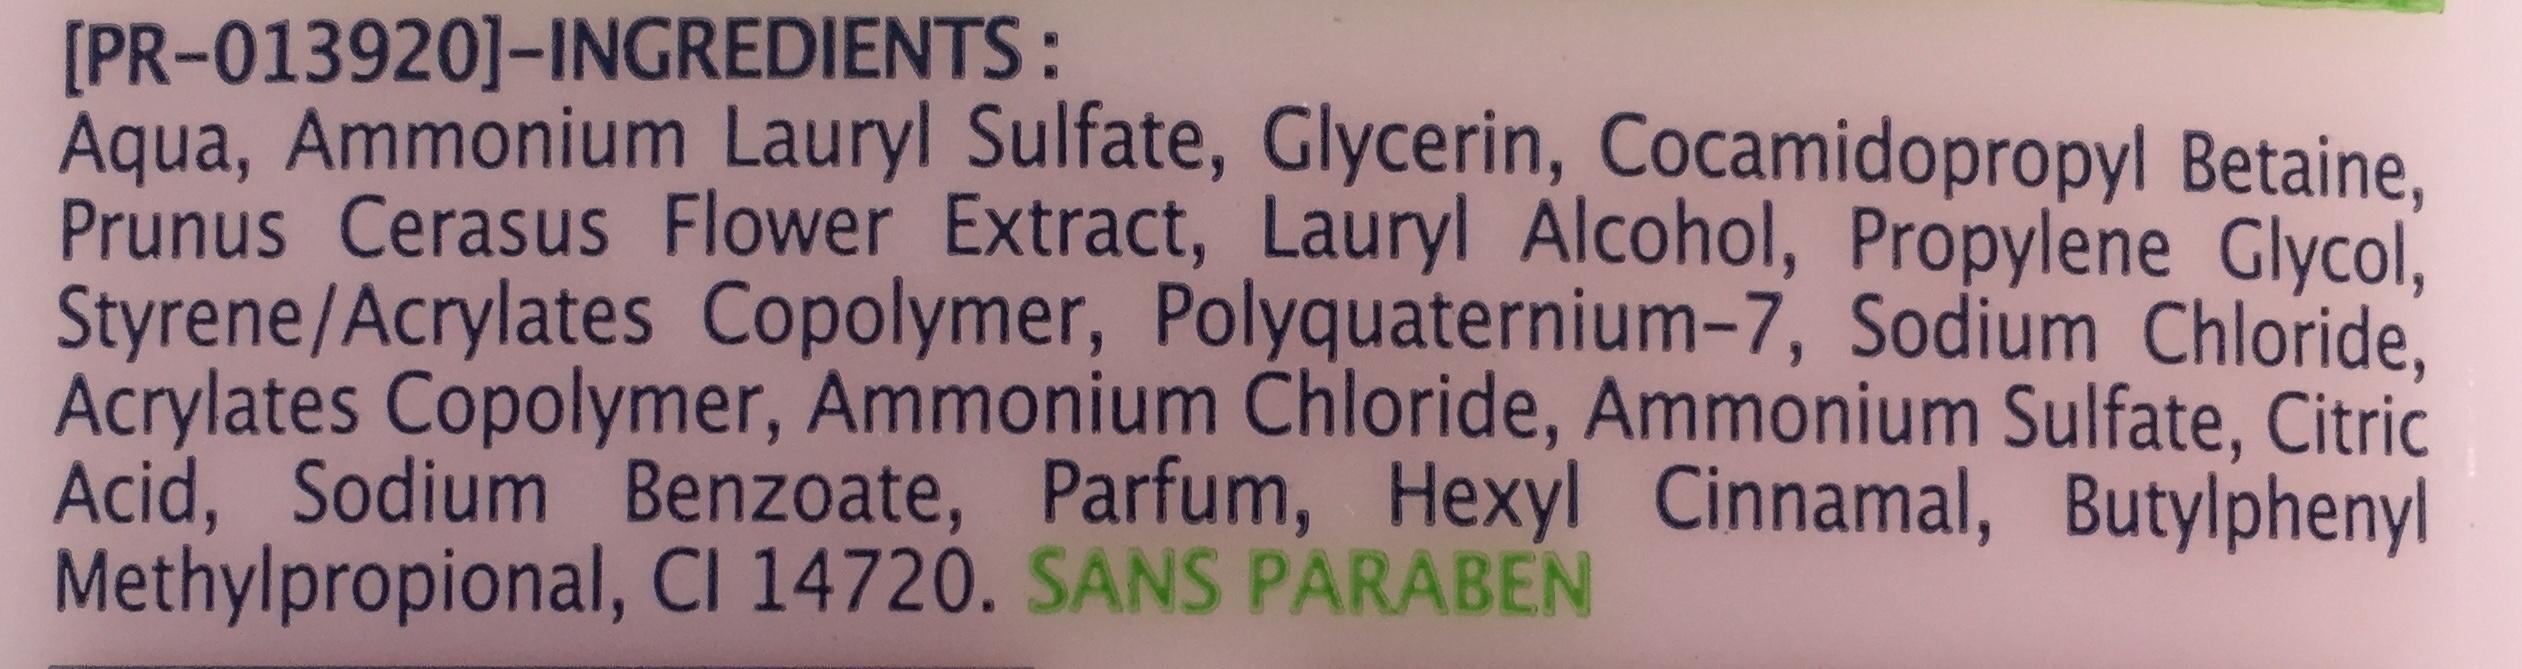 Gel douche Fleur de cerisier - Ingredients